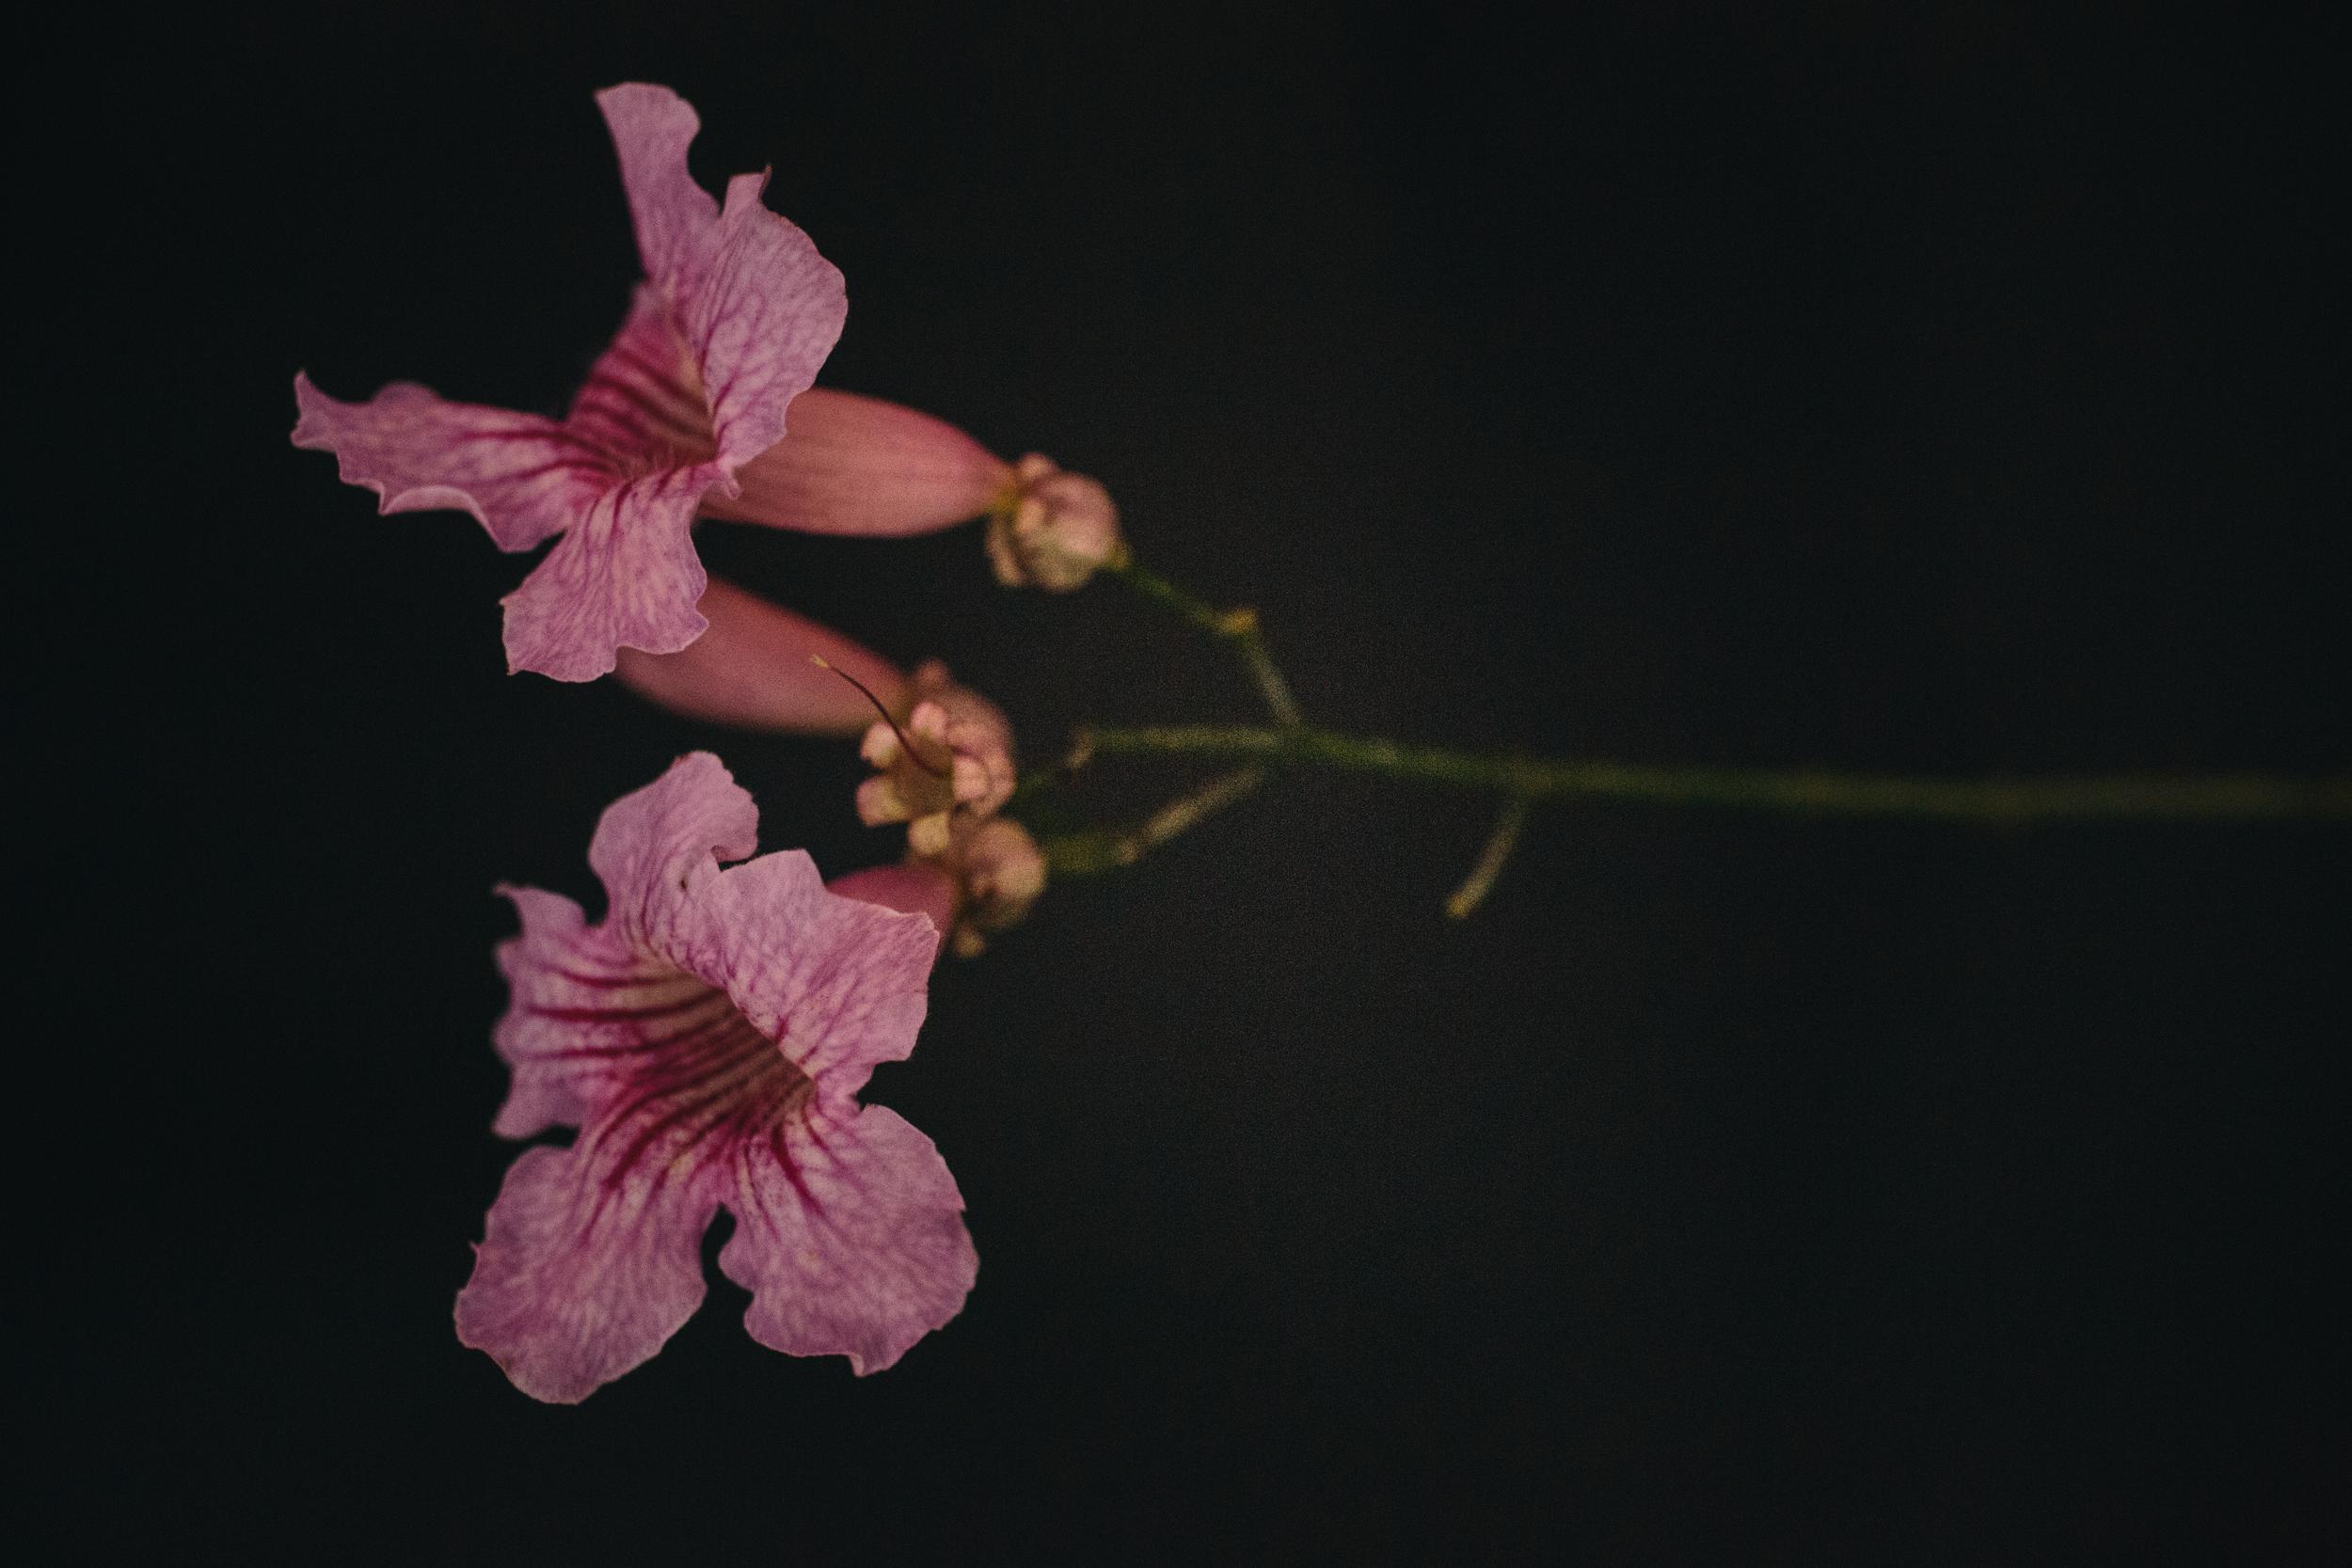 hellosolphoto-fotografia-bodas-flores-10